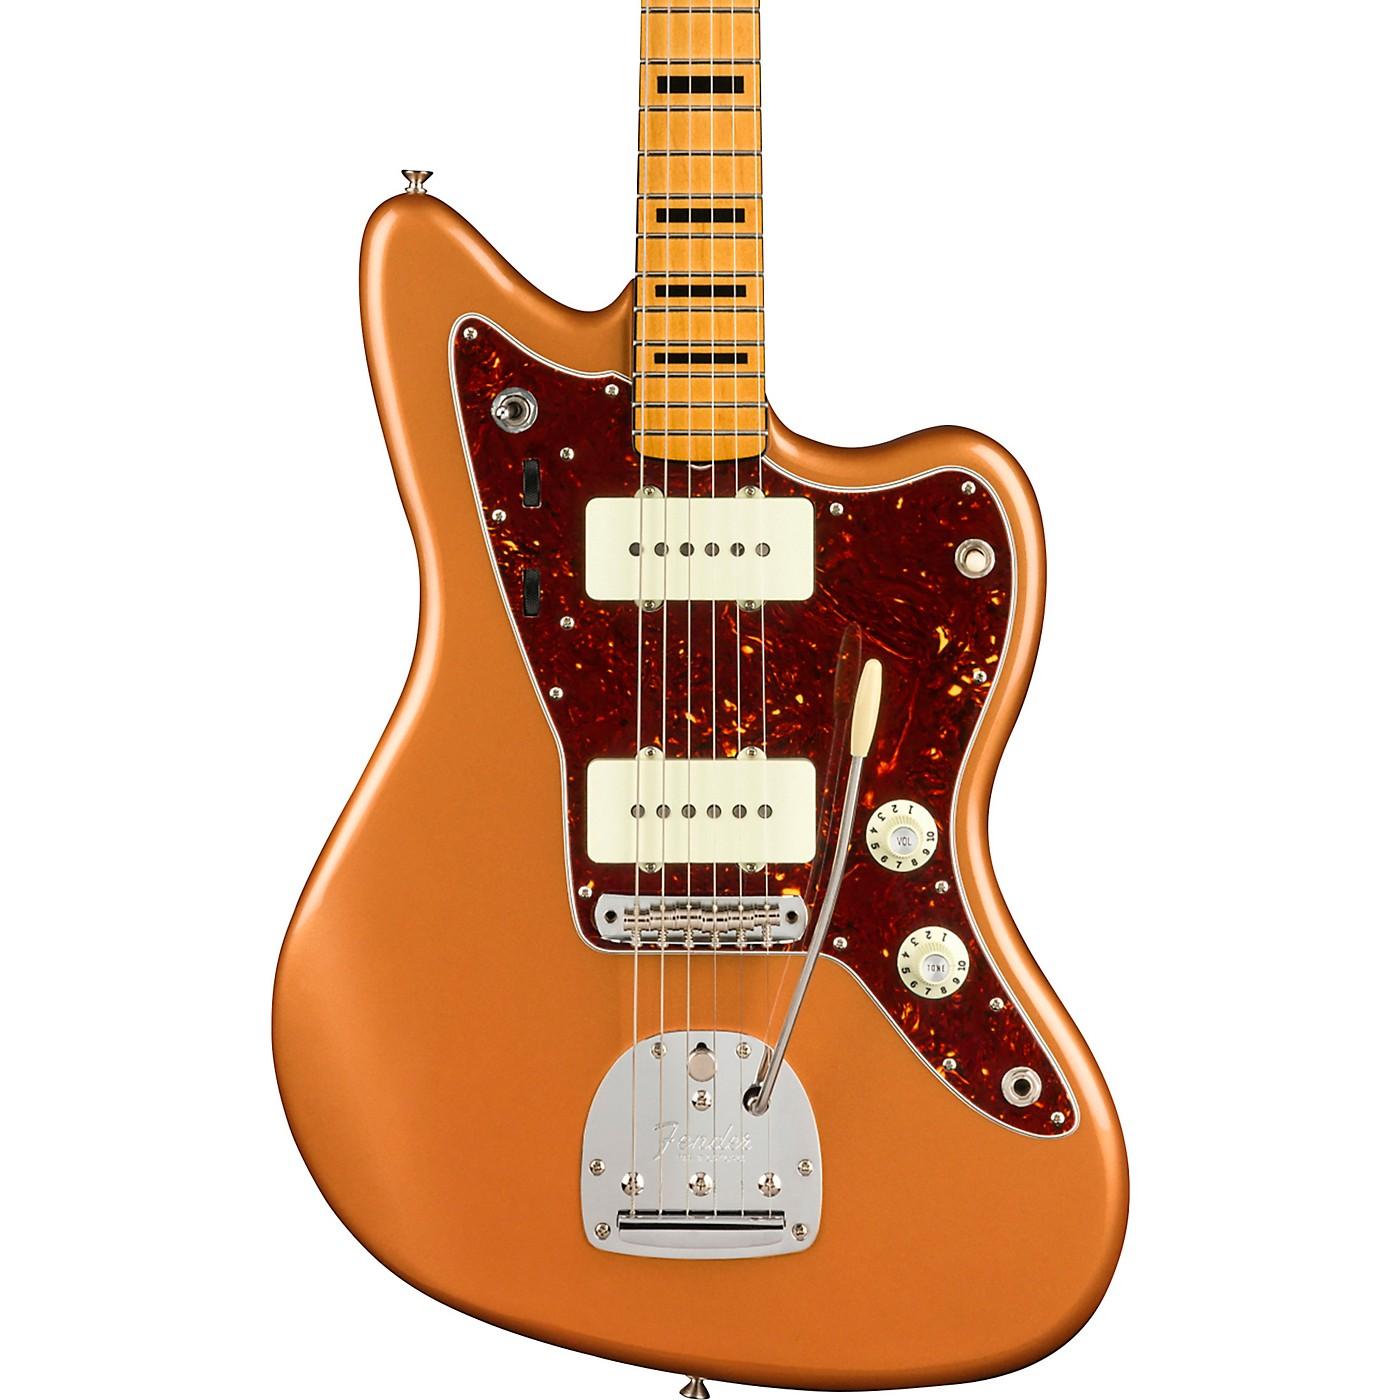 Fender Troy Van Leeuwen Jazzmaster Maple Fingerboard Electric Guitar thumbnail